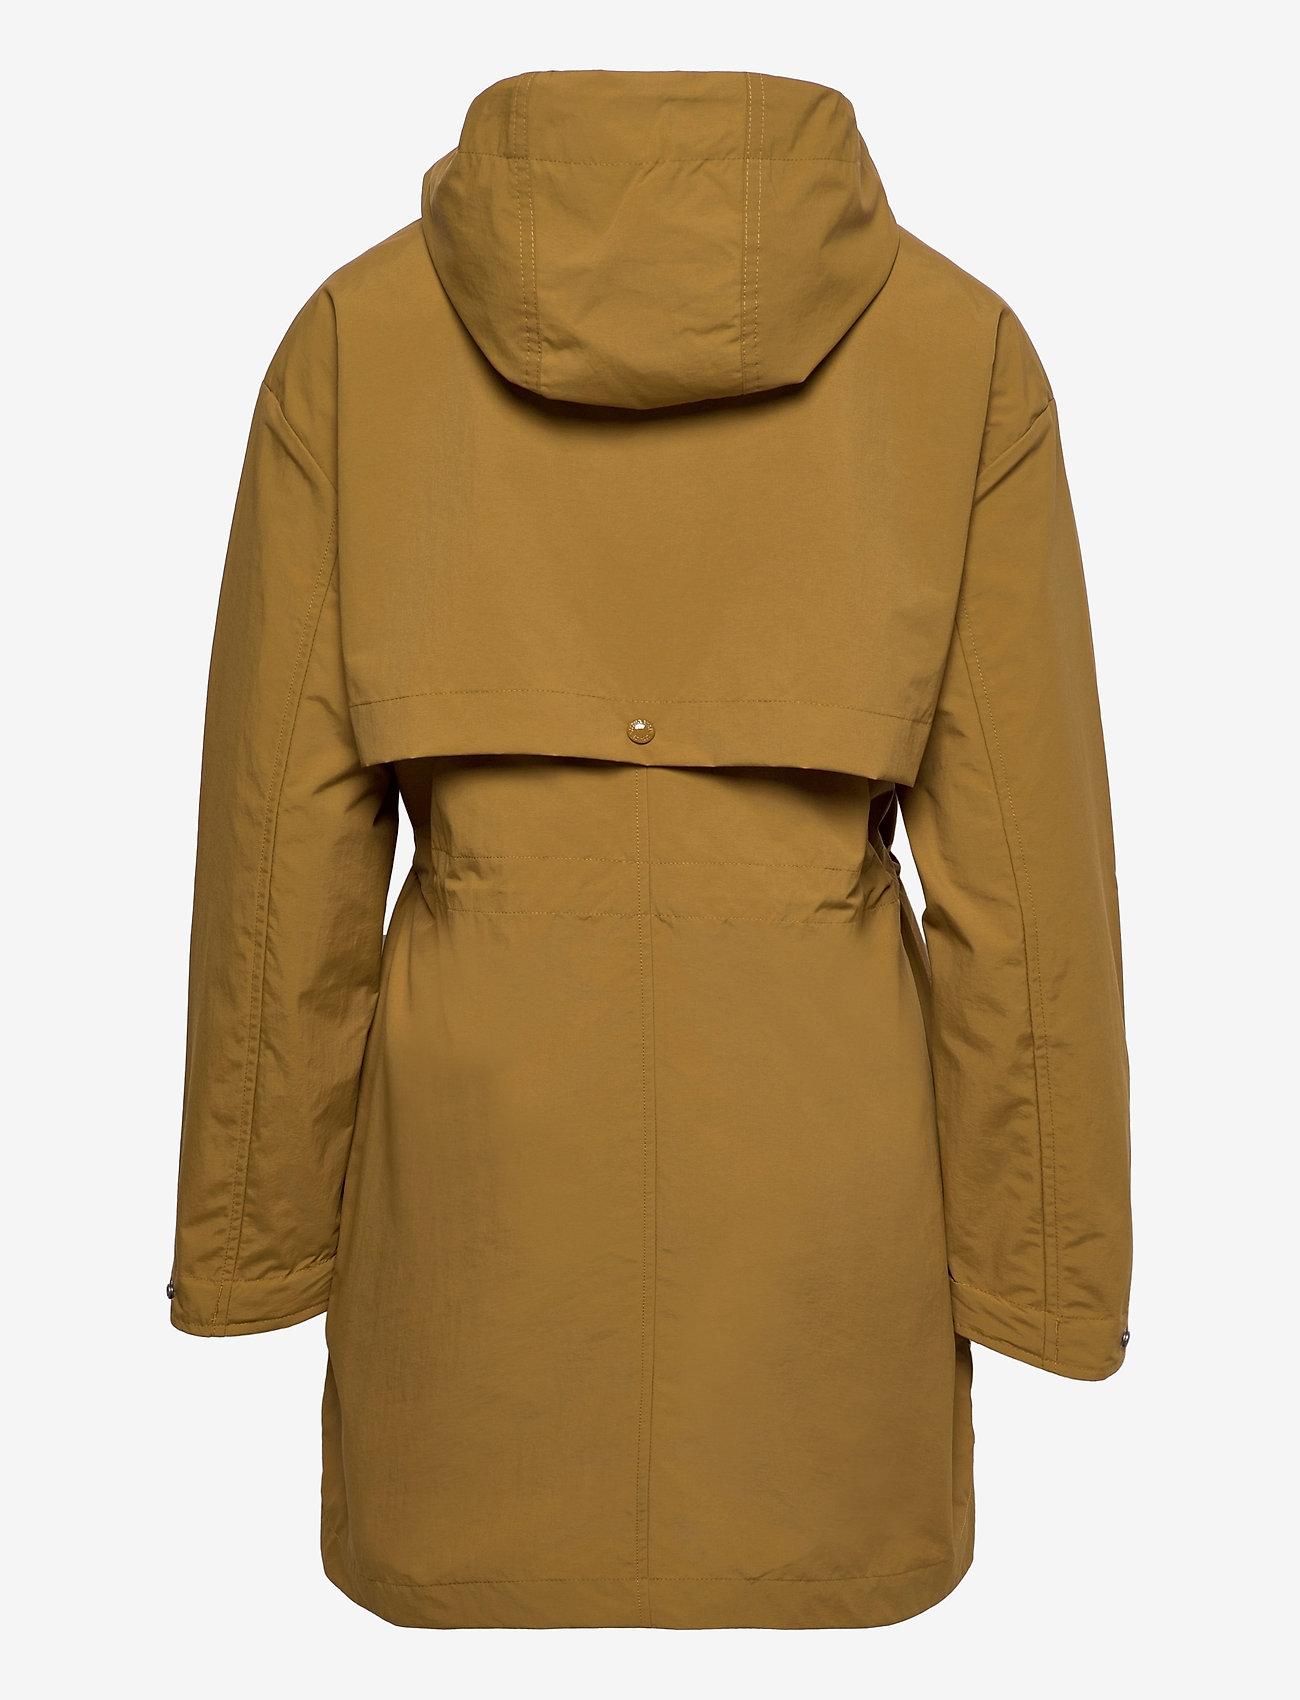 Polo Ralph Lauren - MDNA WNDBRK-JACKET - parka coats - harvest - 1